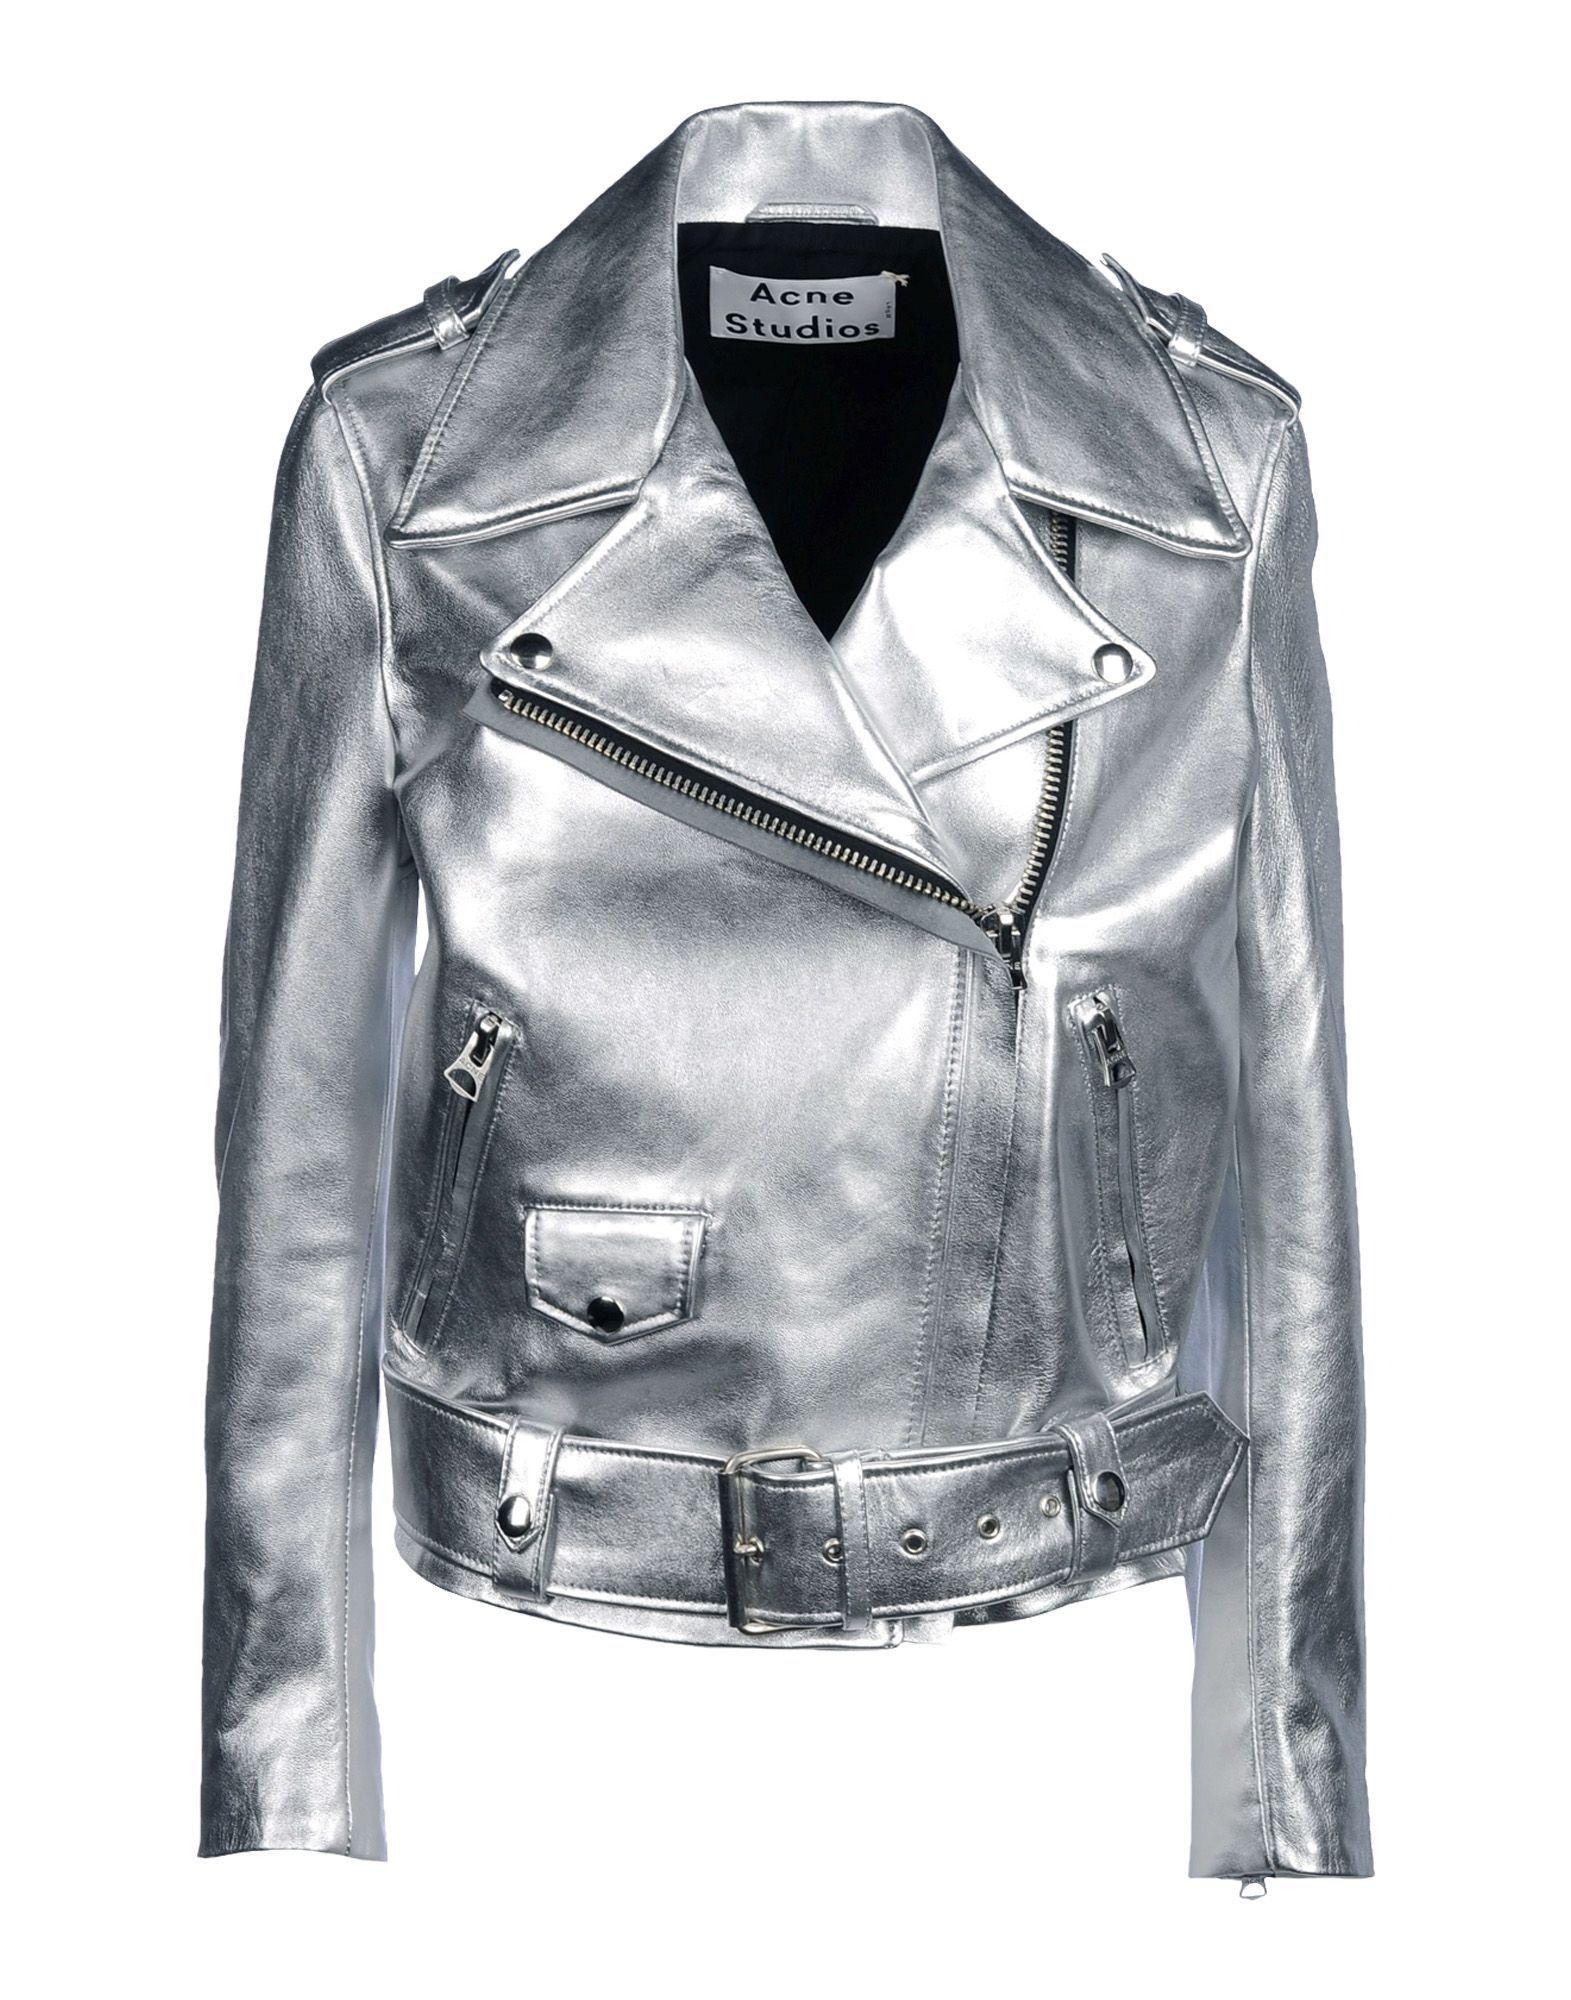 Metallic leather jacket by ACNE STUDIOS silver biker